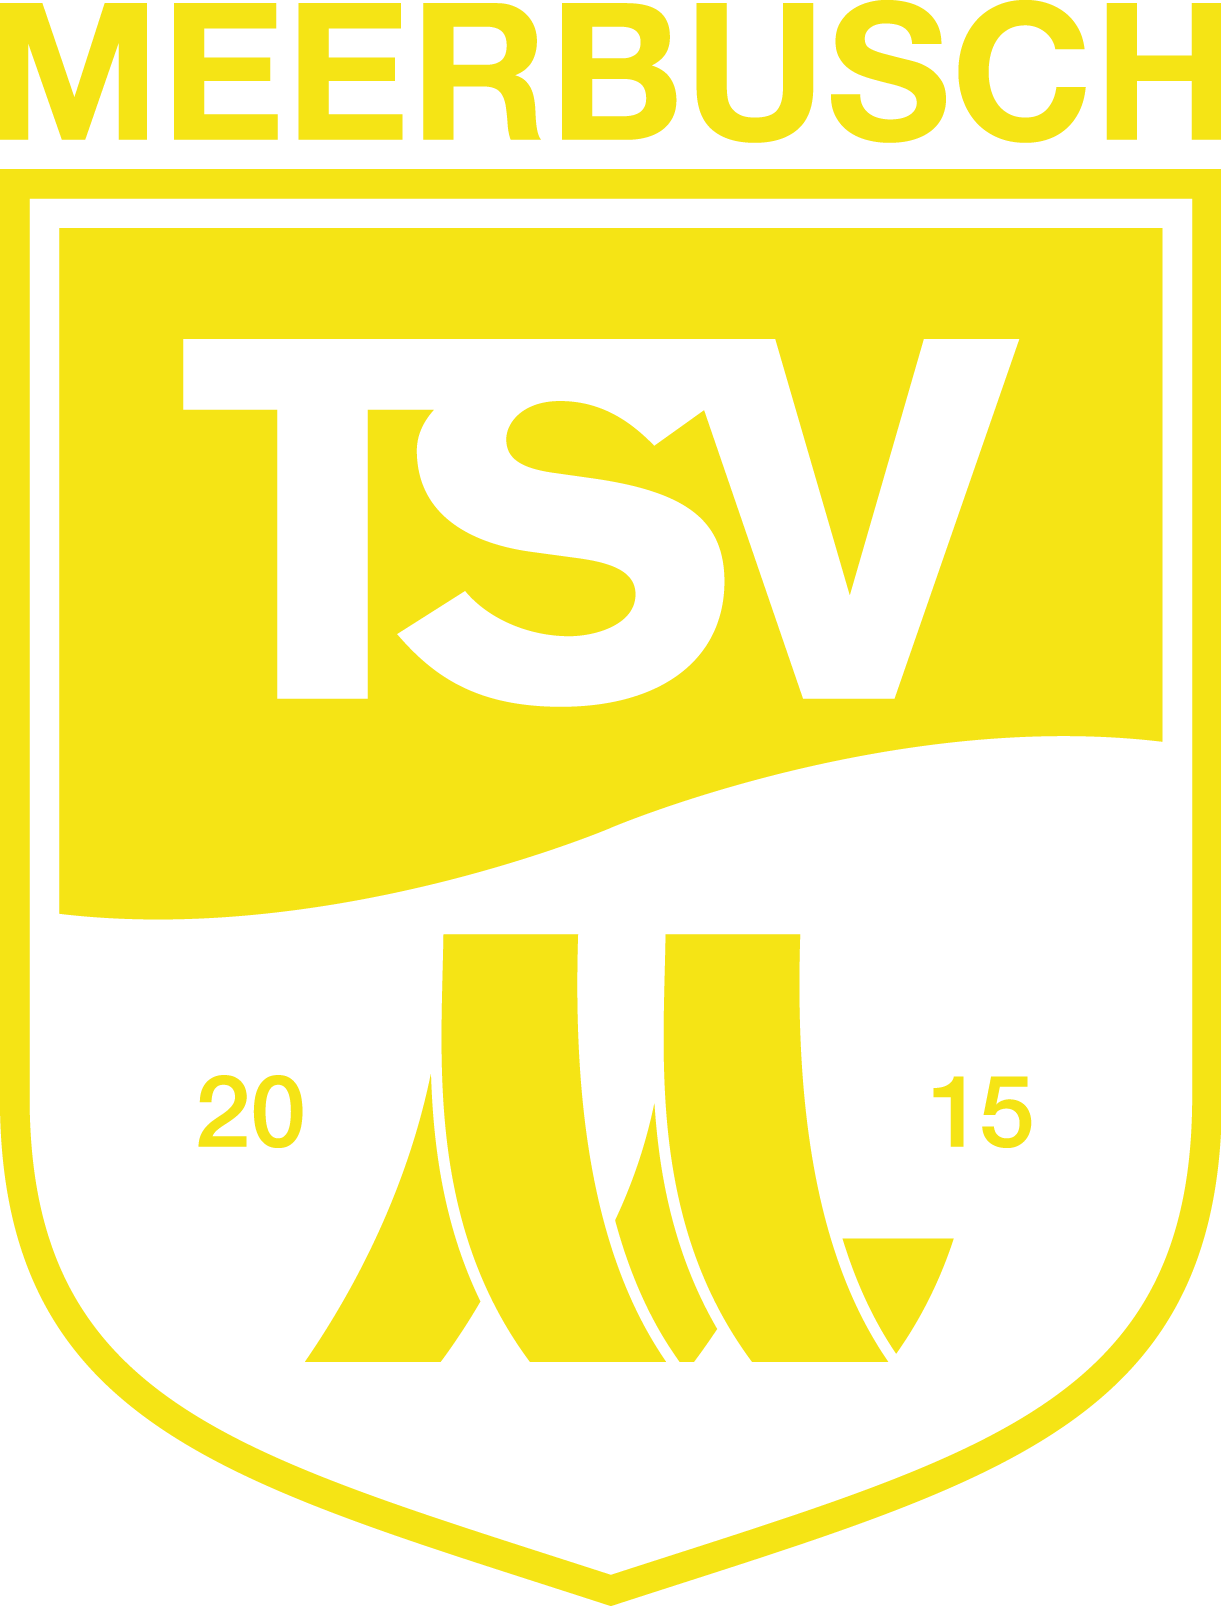 TSV Meerbusch – Fussball